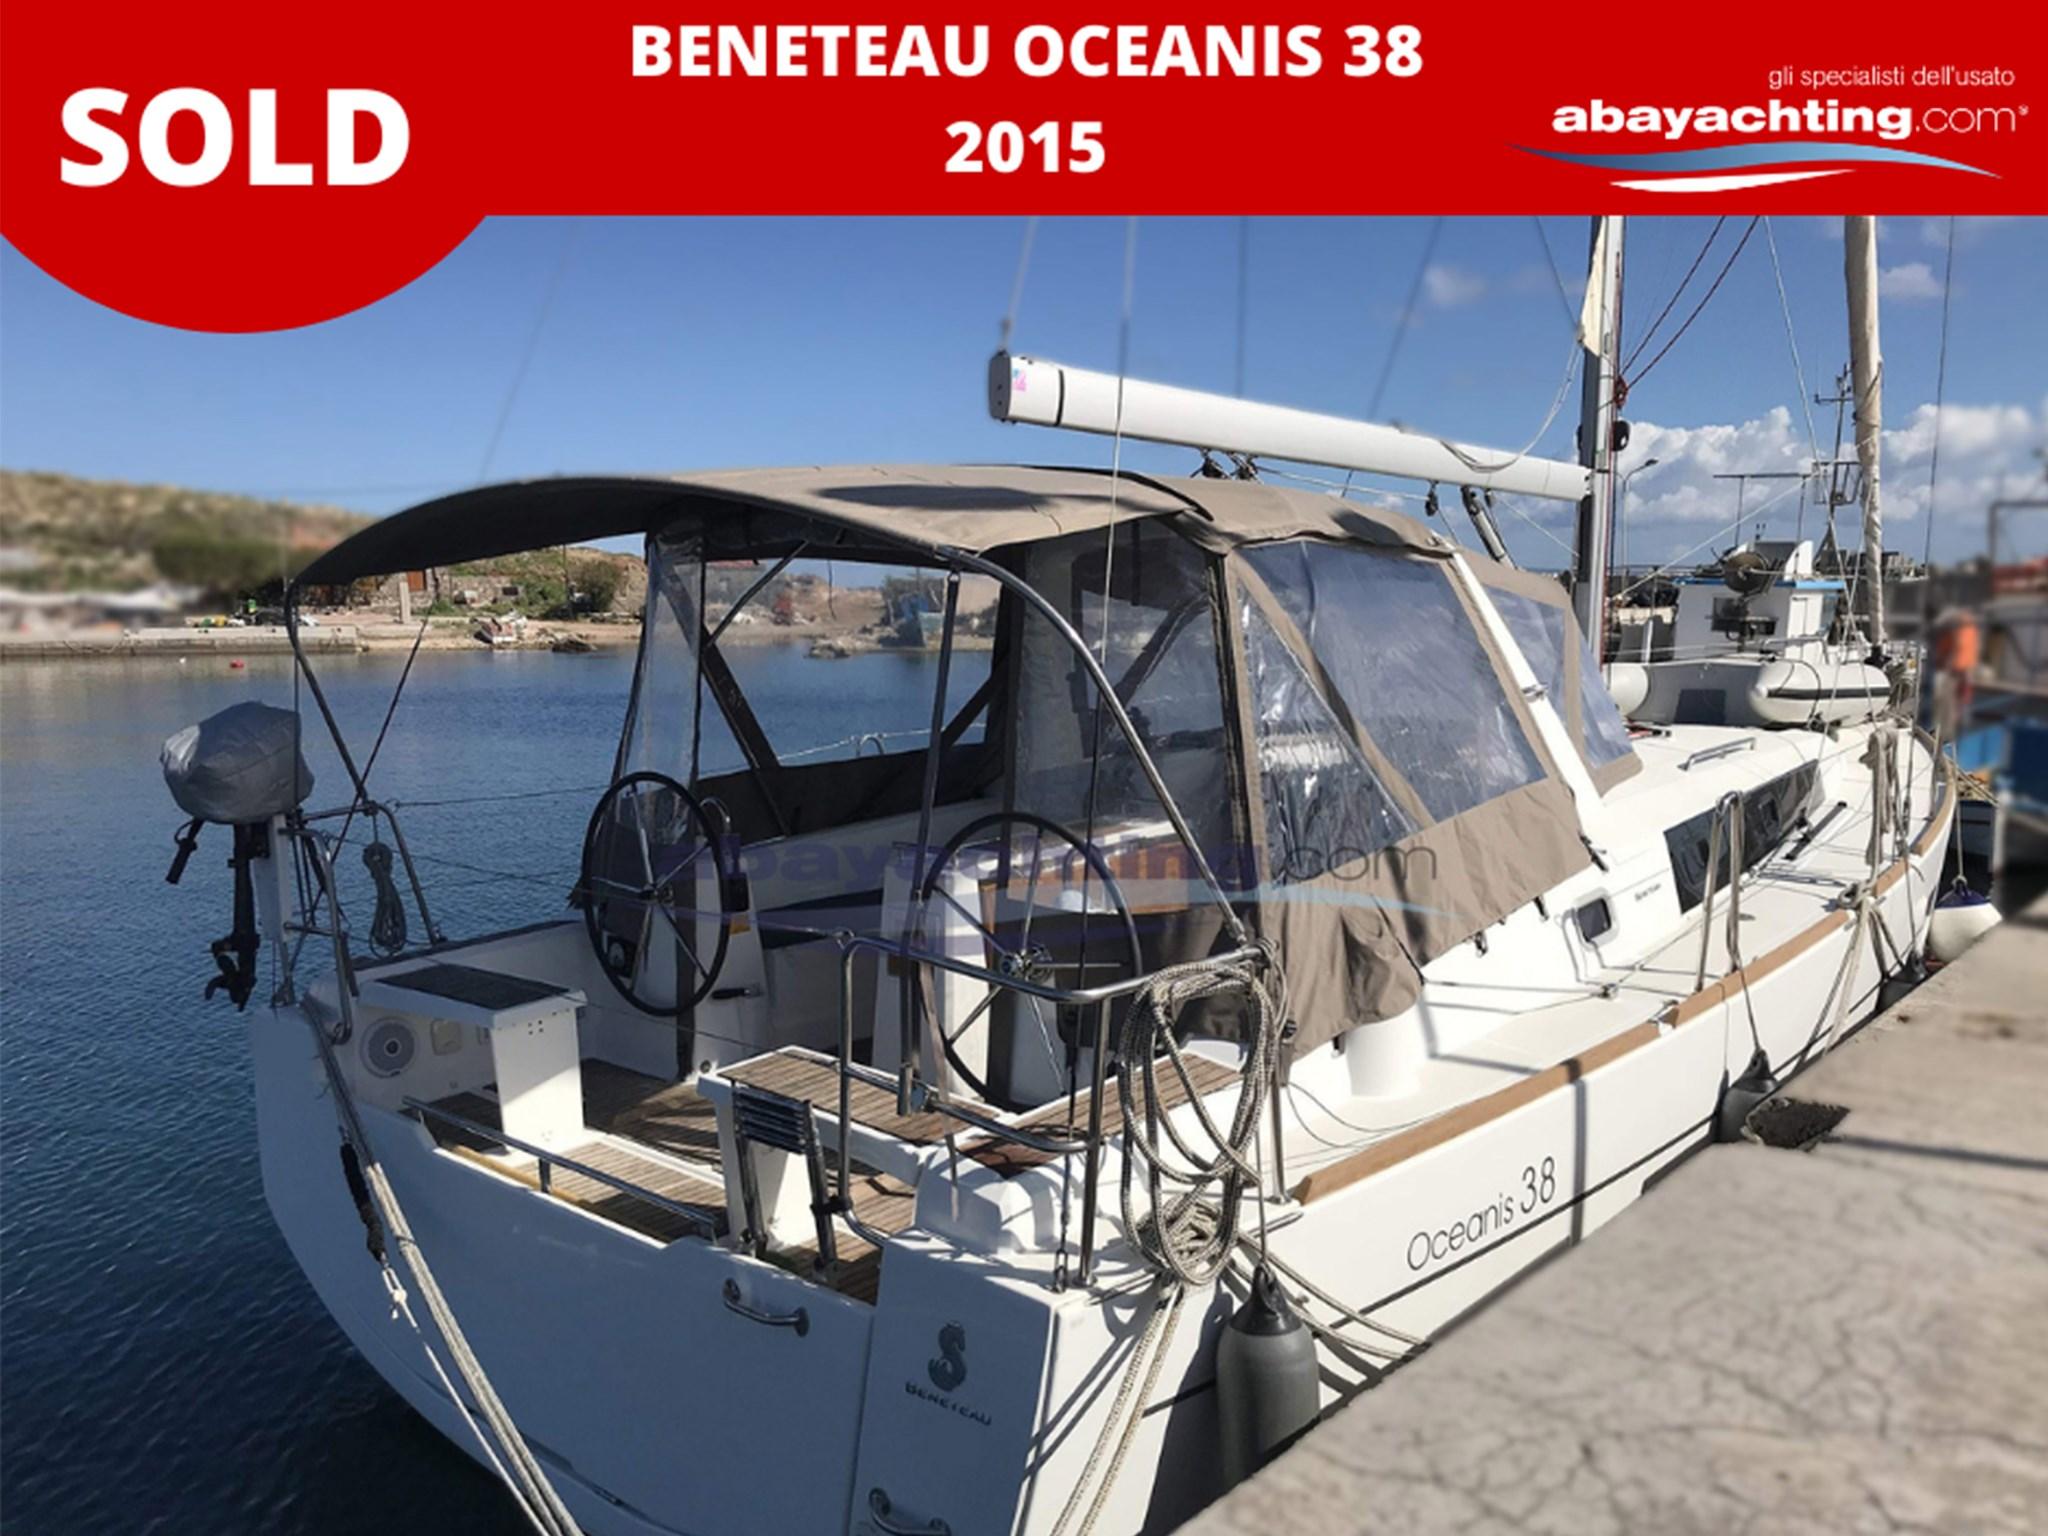 Beneteau Oceanis 38 vendu